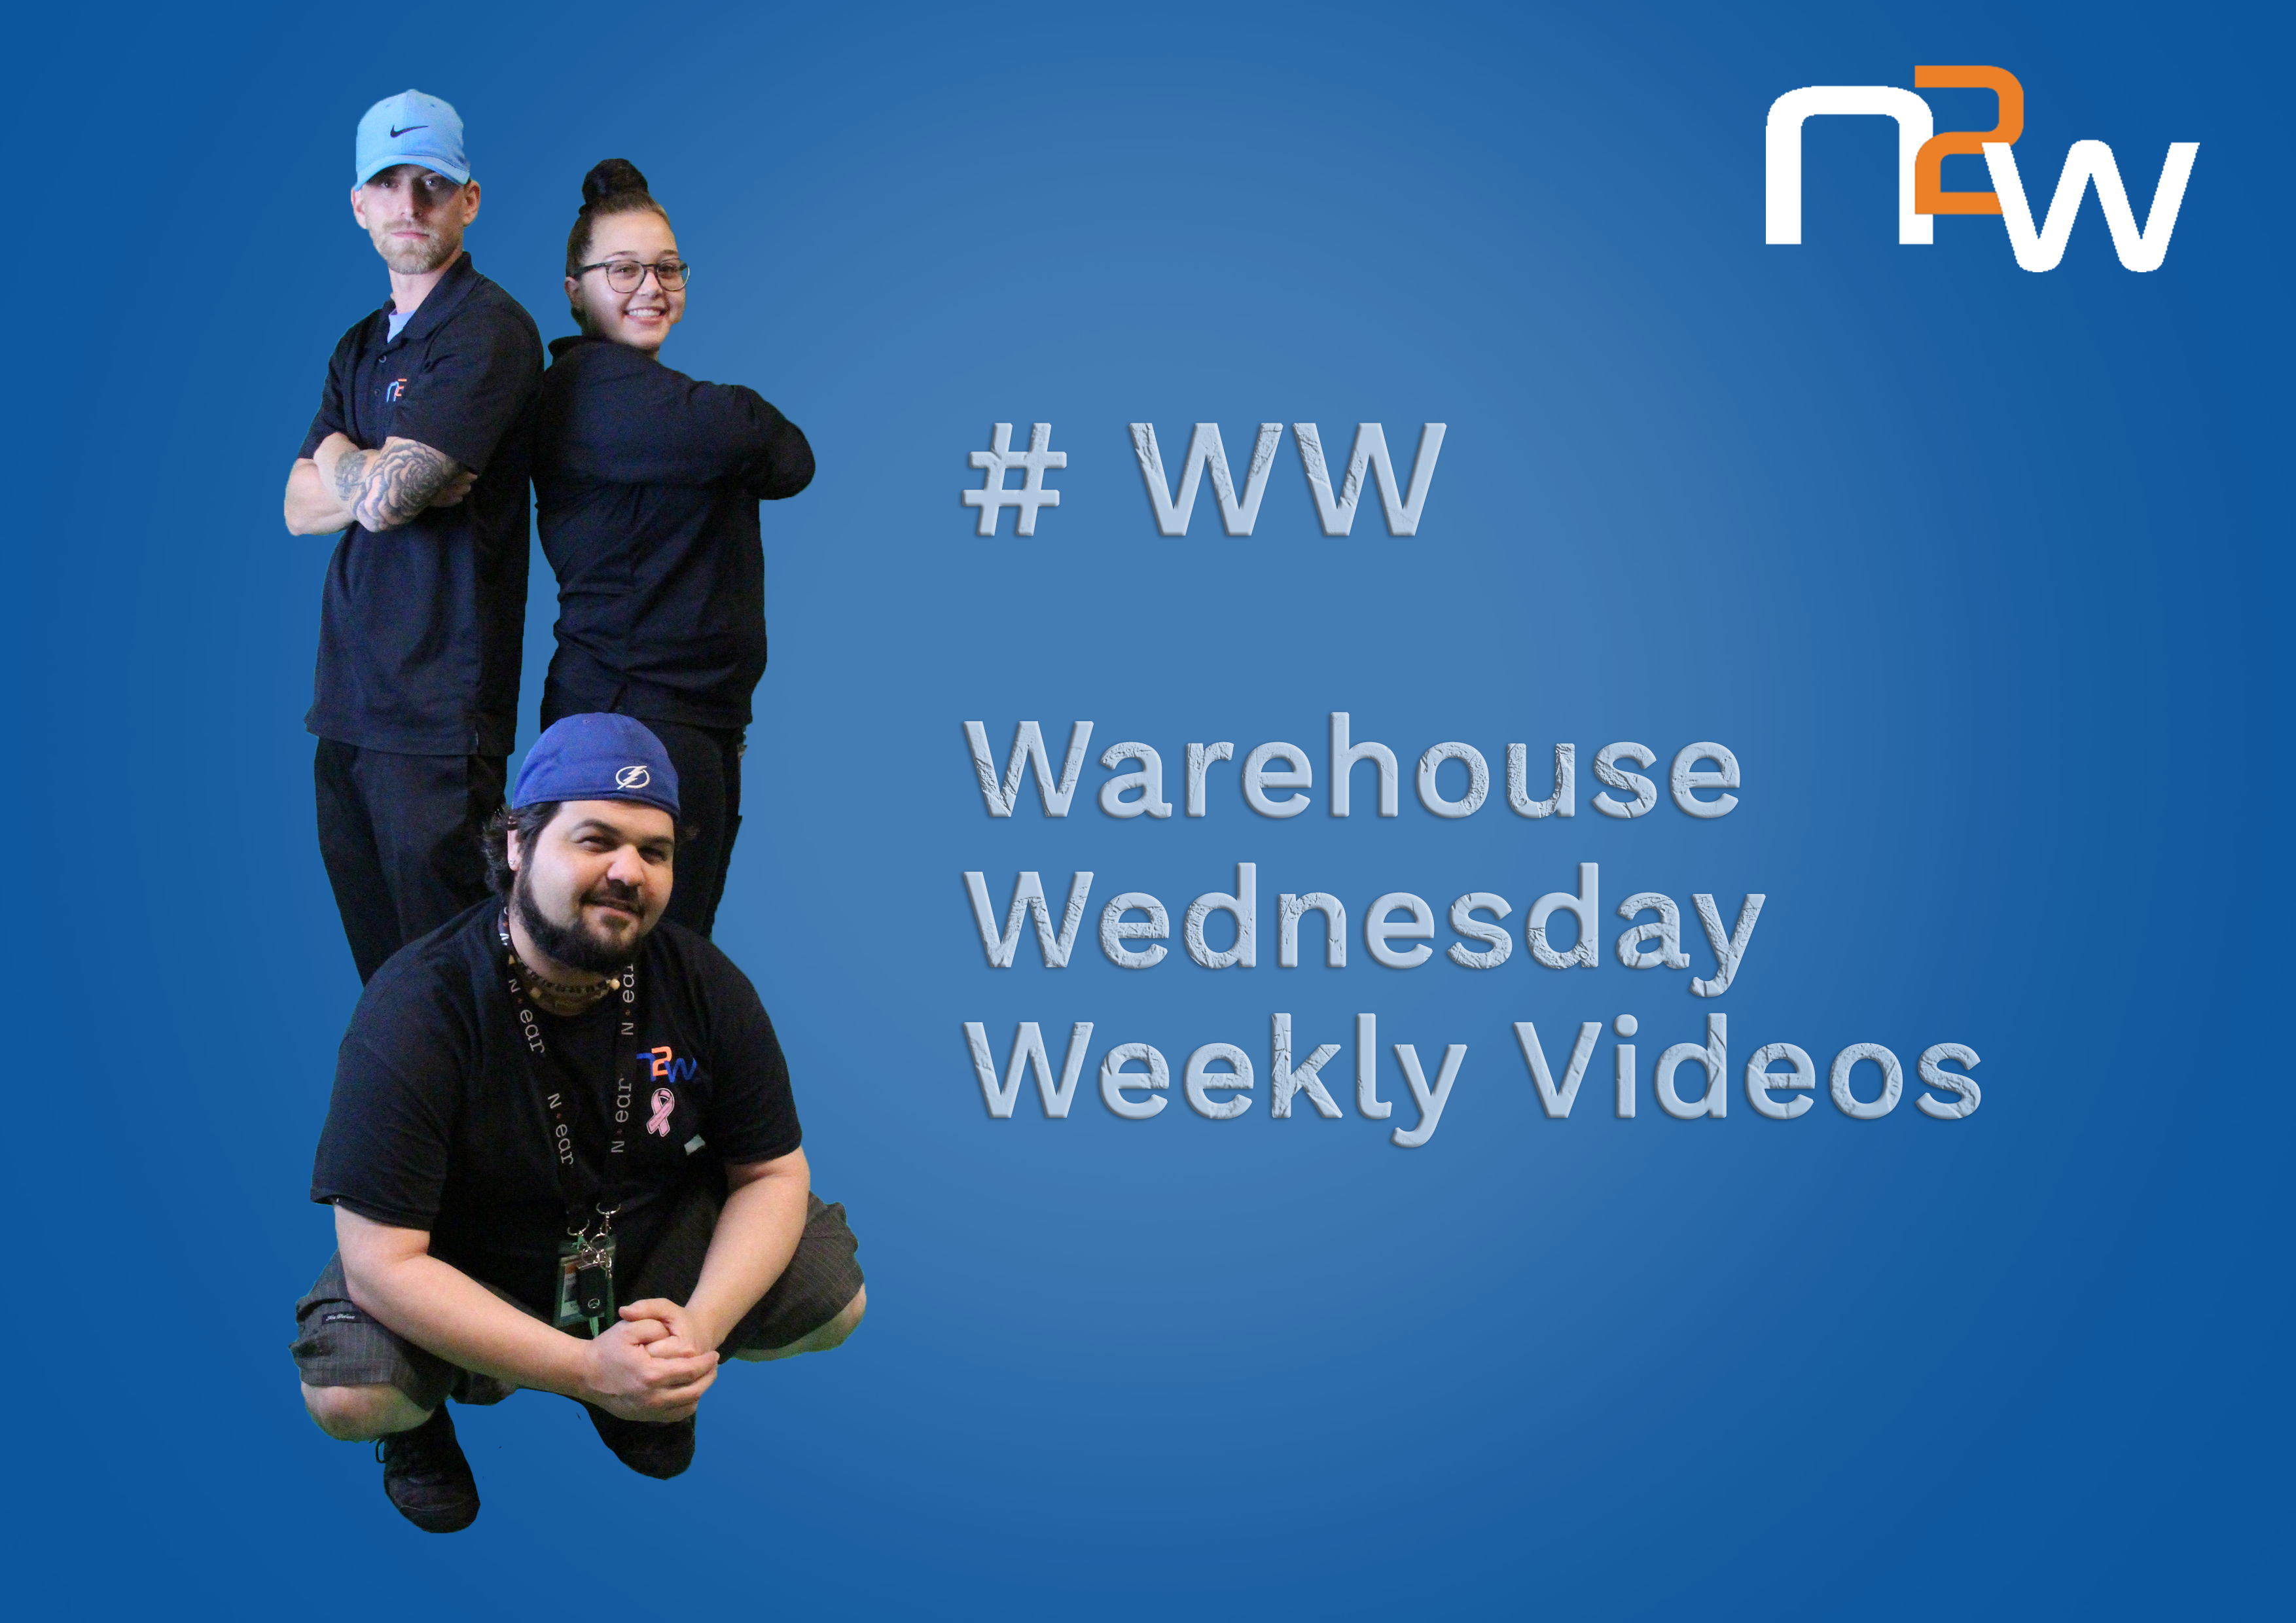 Warehouse Wednesday